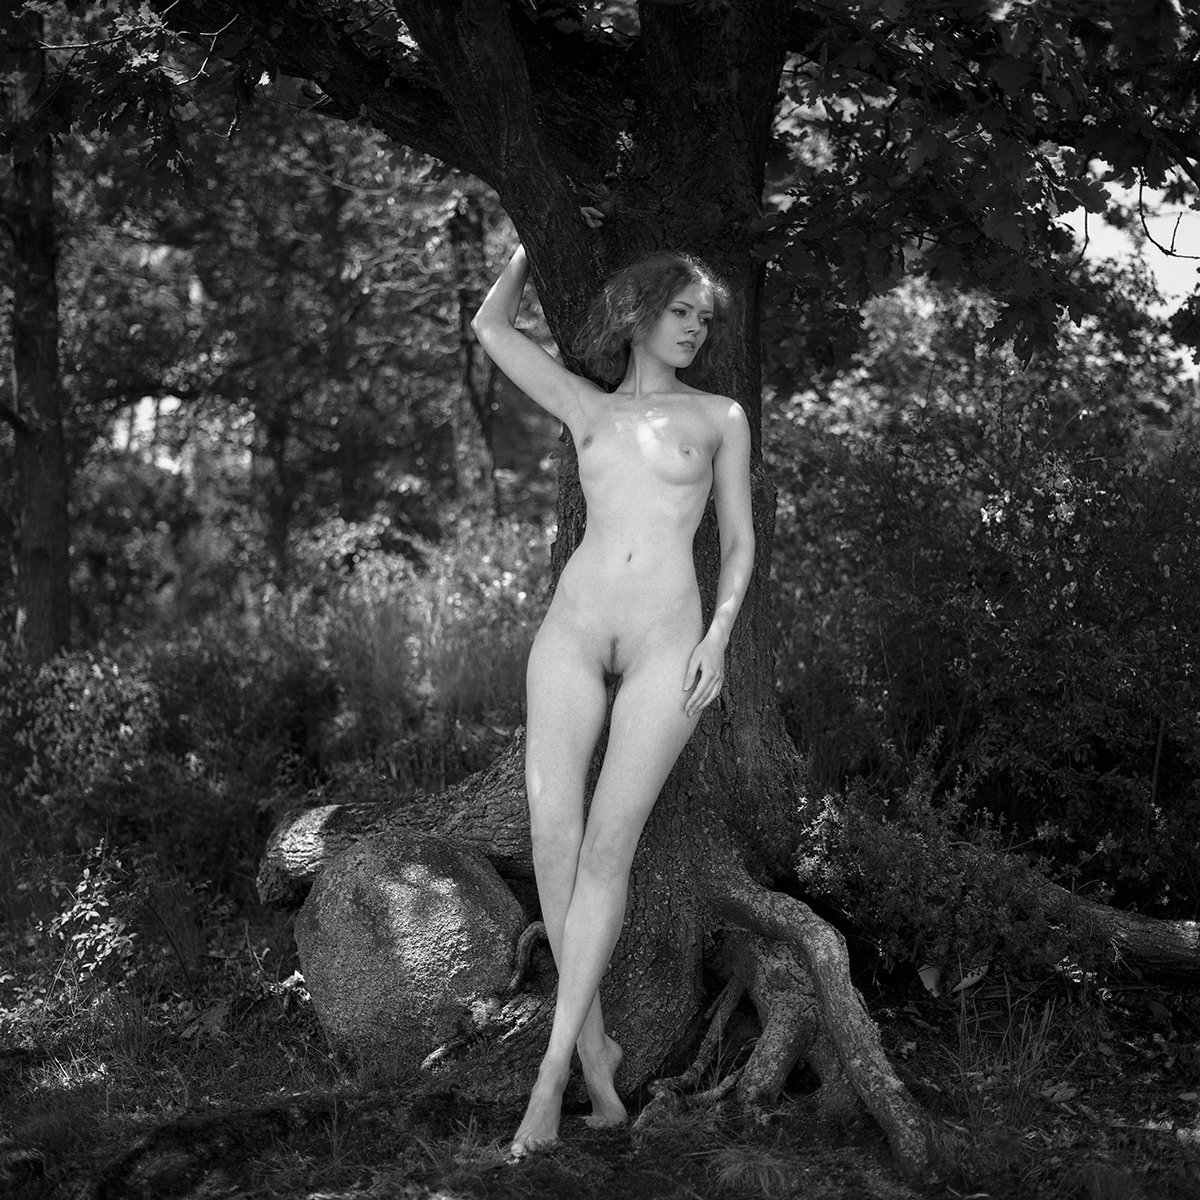 akt, nude, analog, hasselblad, ninoveron, kaciaryna, kate ri, women, topless, fineart, bw, 6x6,, NinoVeron